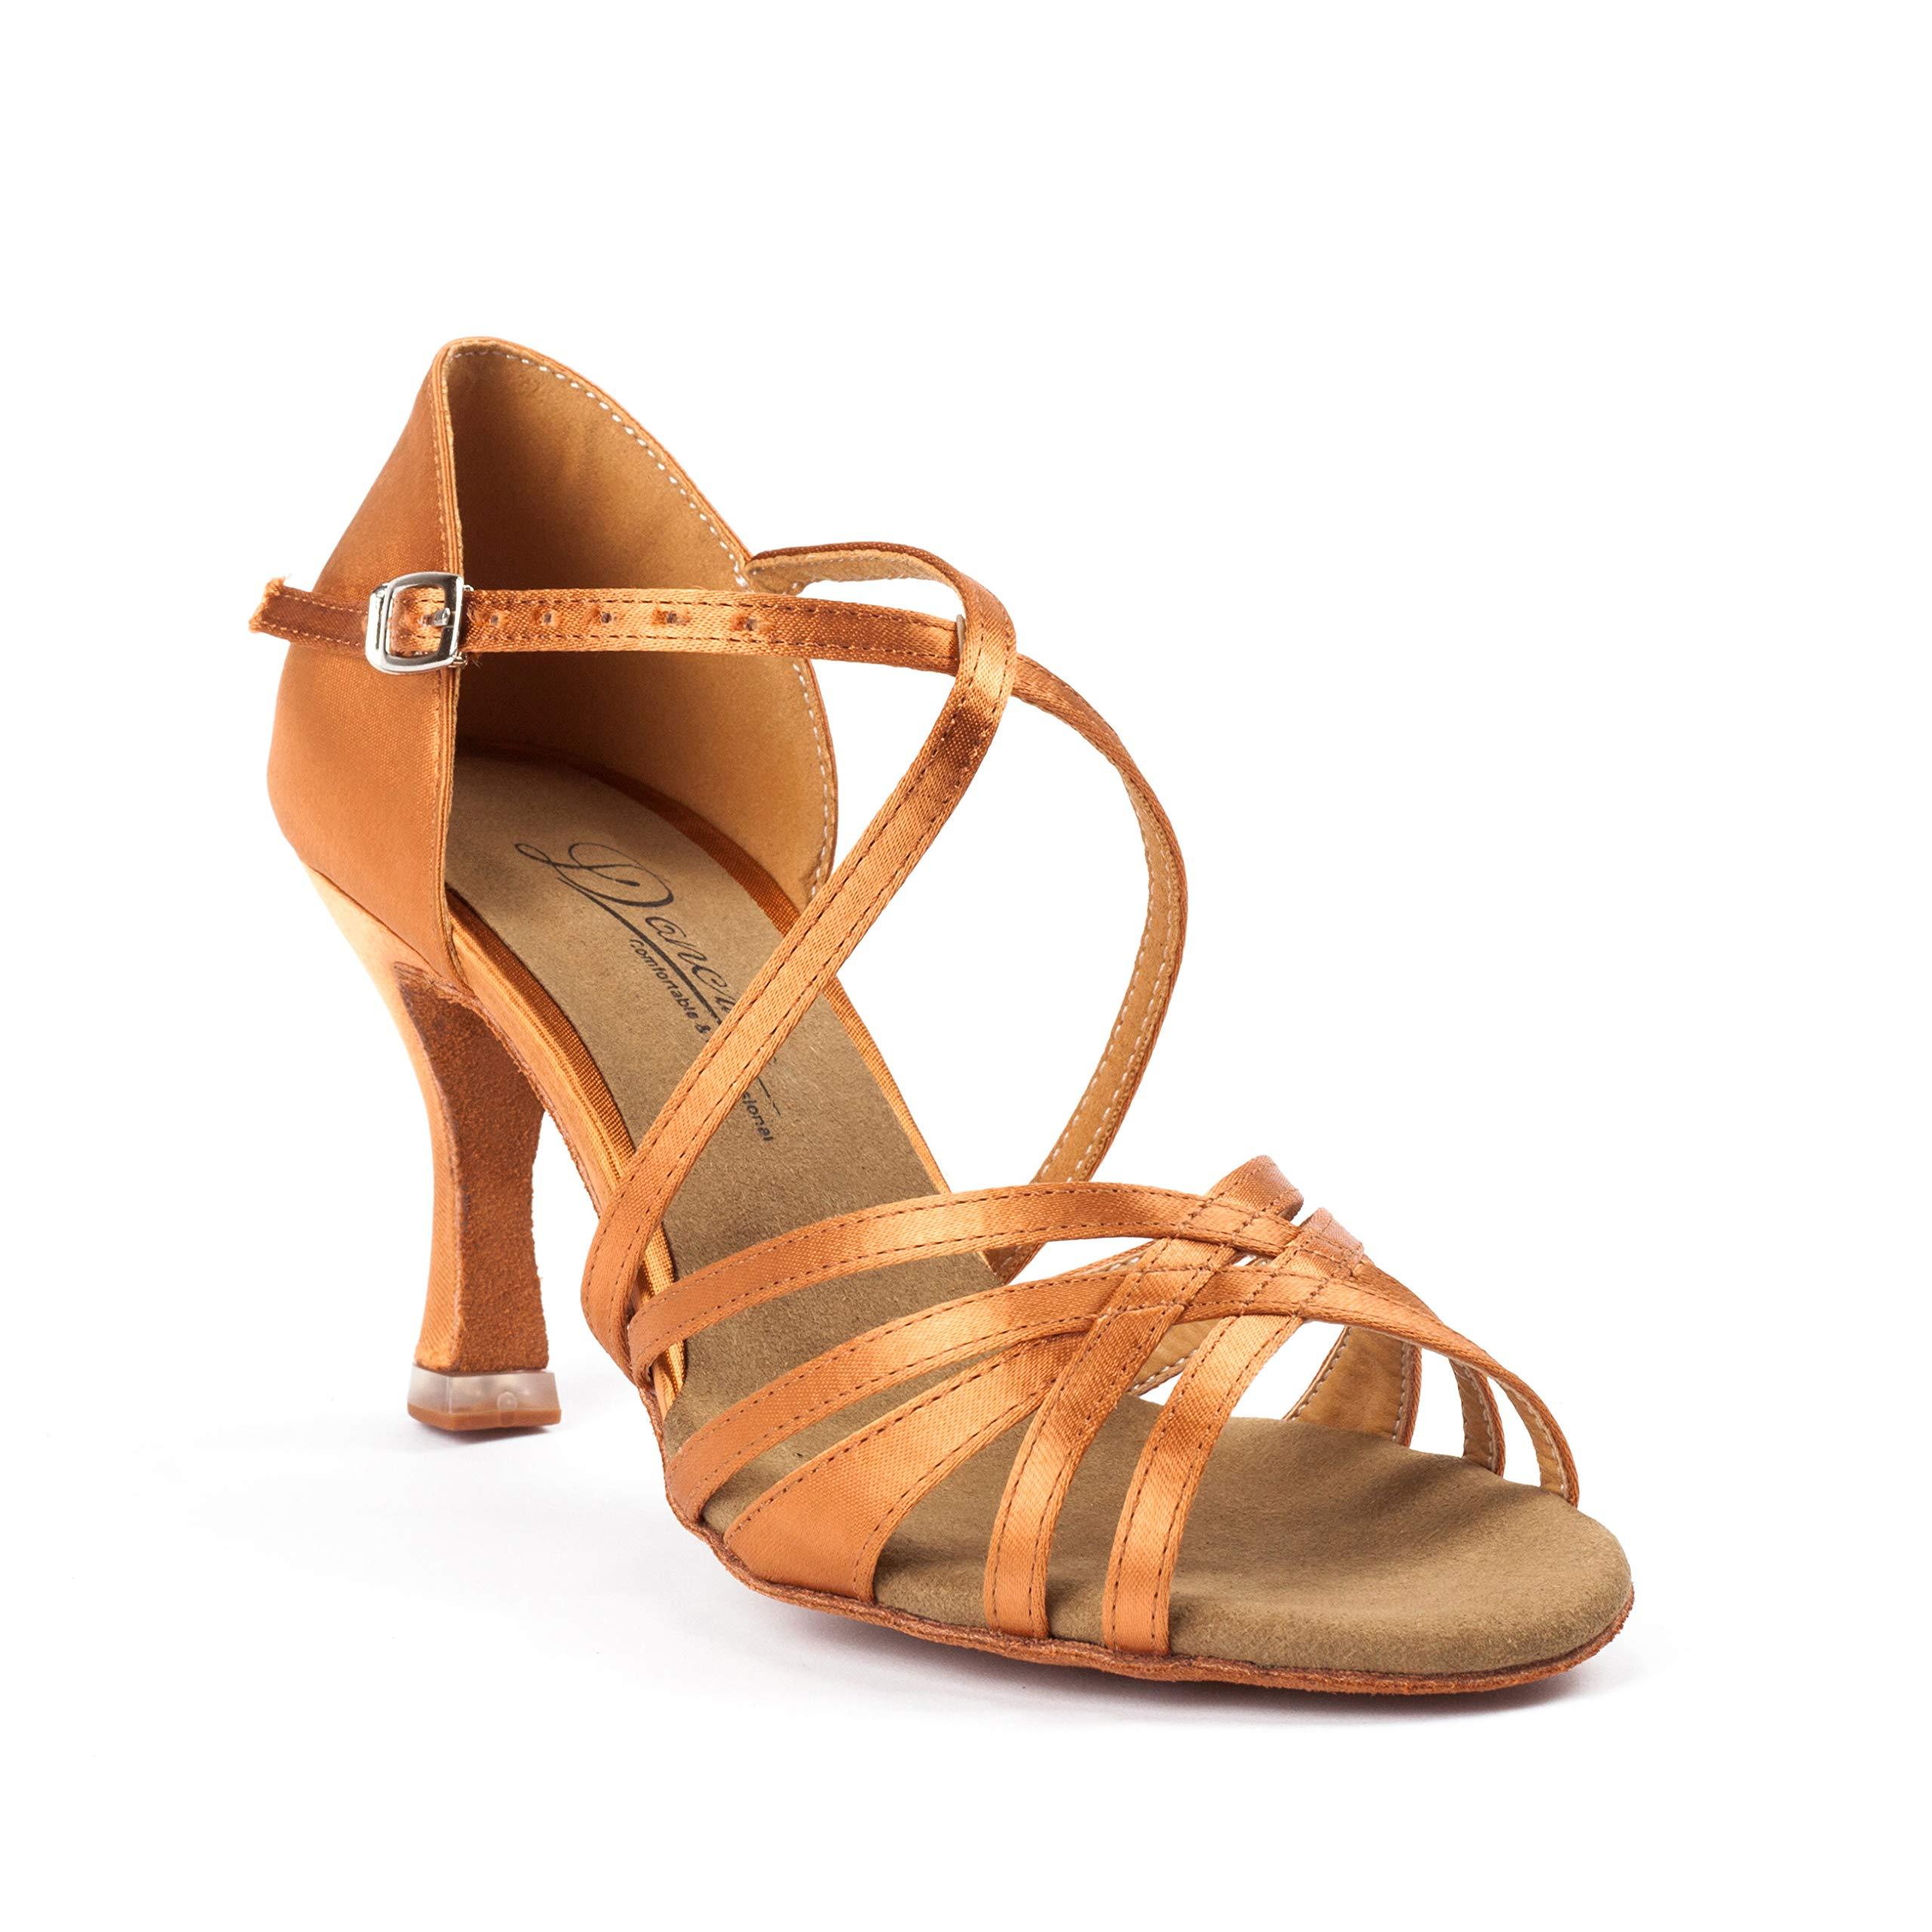 Dancine Ballroom Latin Social Salsa Tango Dance Shoes,Double-Layer Heel Tip,Premium Satin,Four Styles (8 B(M) US, Fay Tan) by Dancine